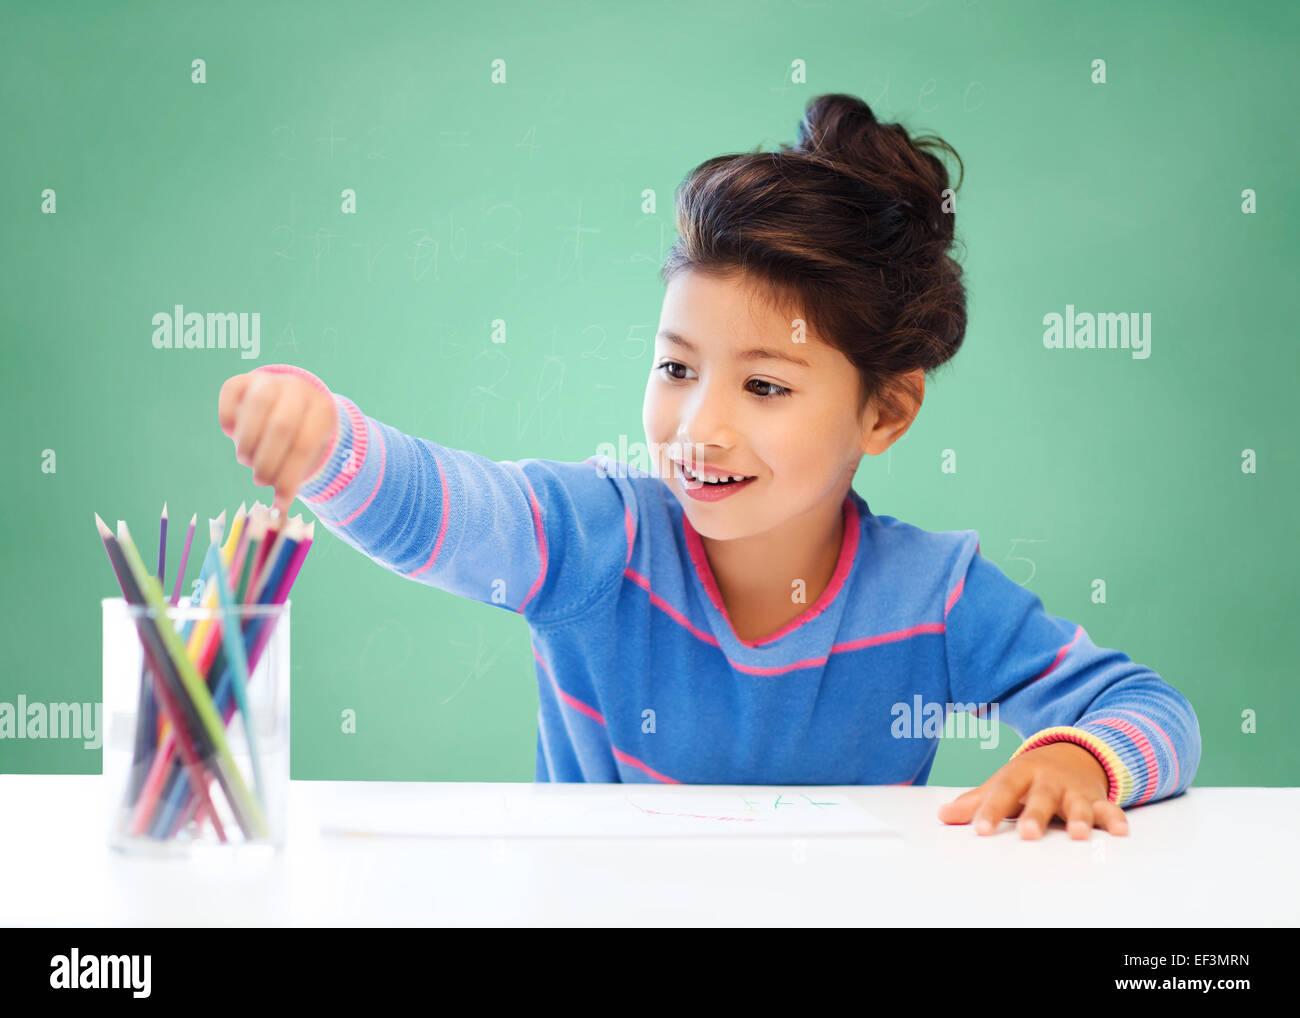 Art drawing board pencils immagini & art drawing board pencils fotos